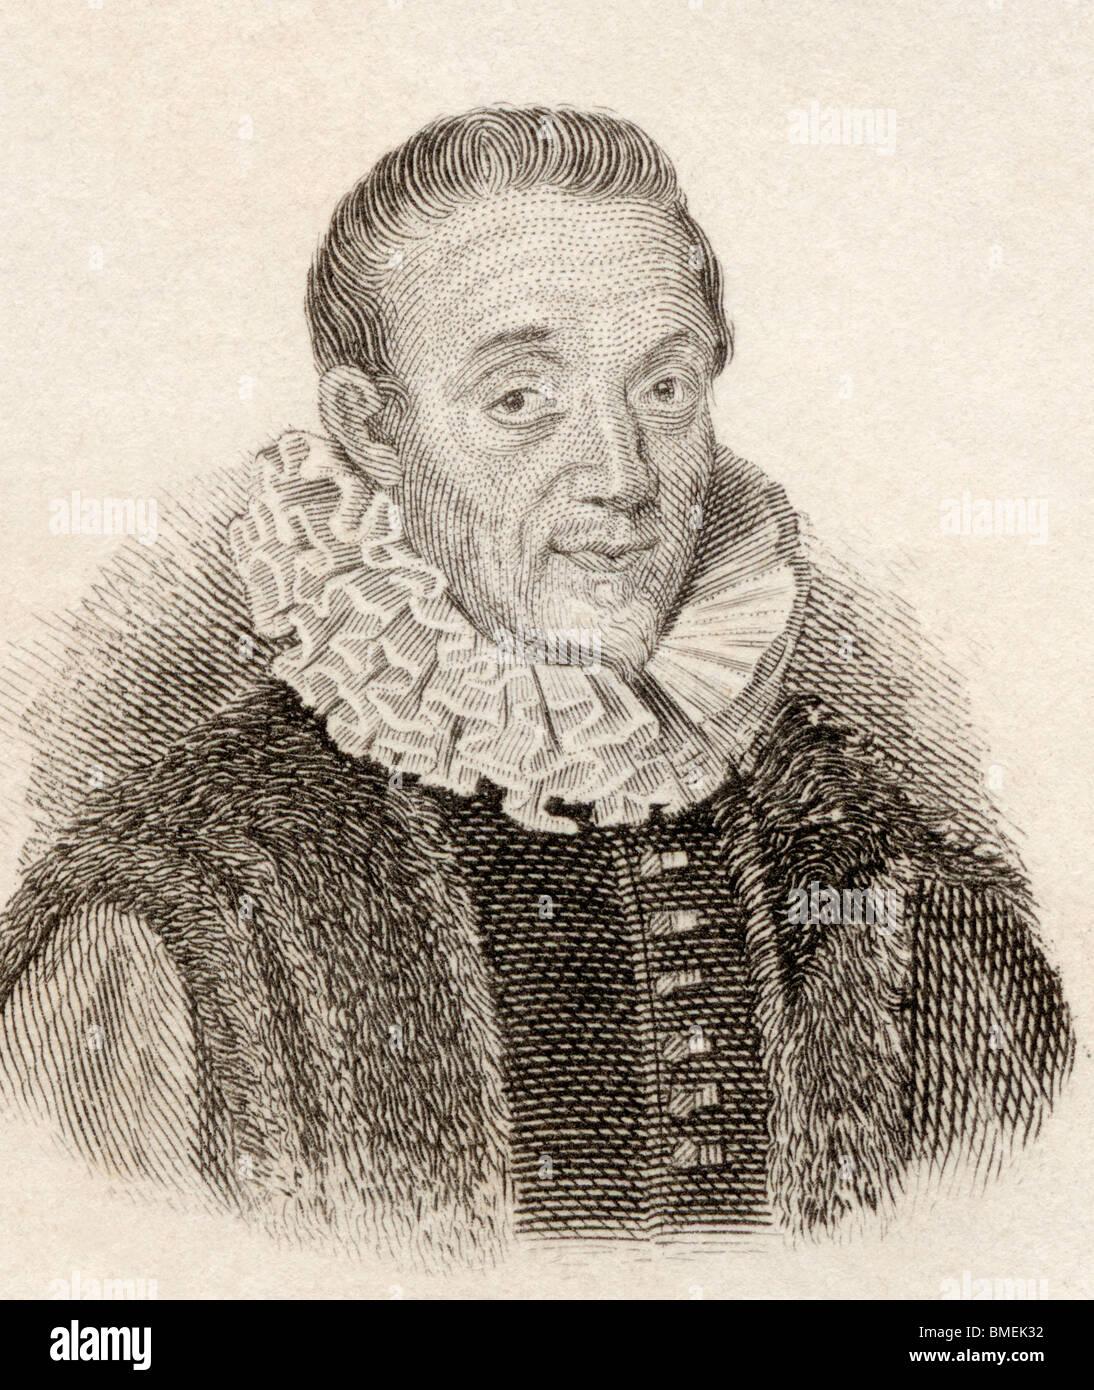 Jacques Auguste de Thou aka Thuanus, 1553 to 1617. French historian. - Stock Image